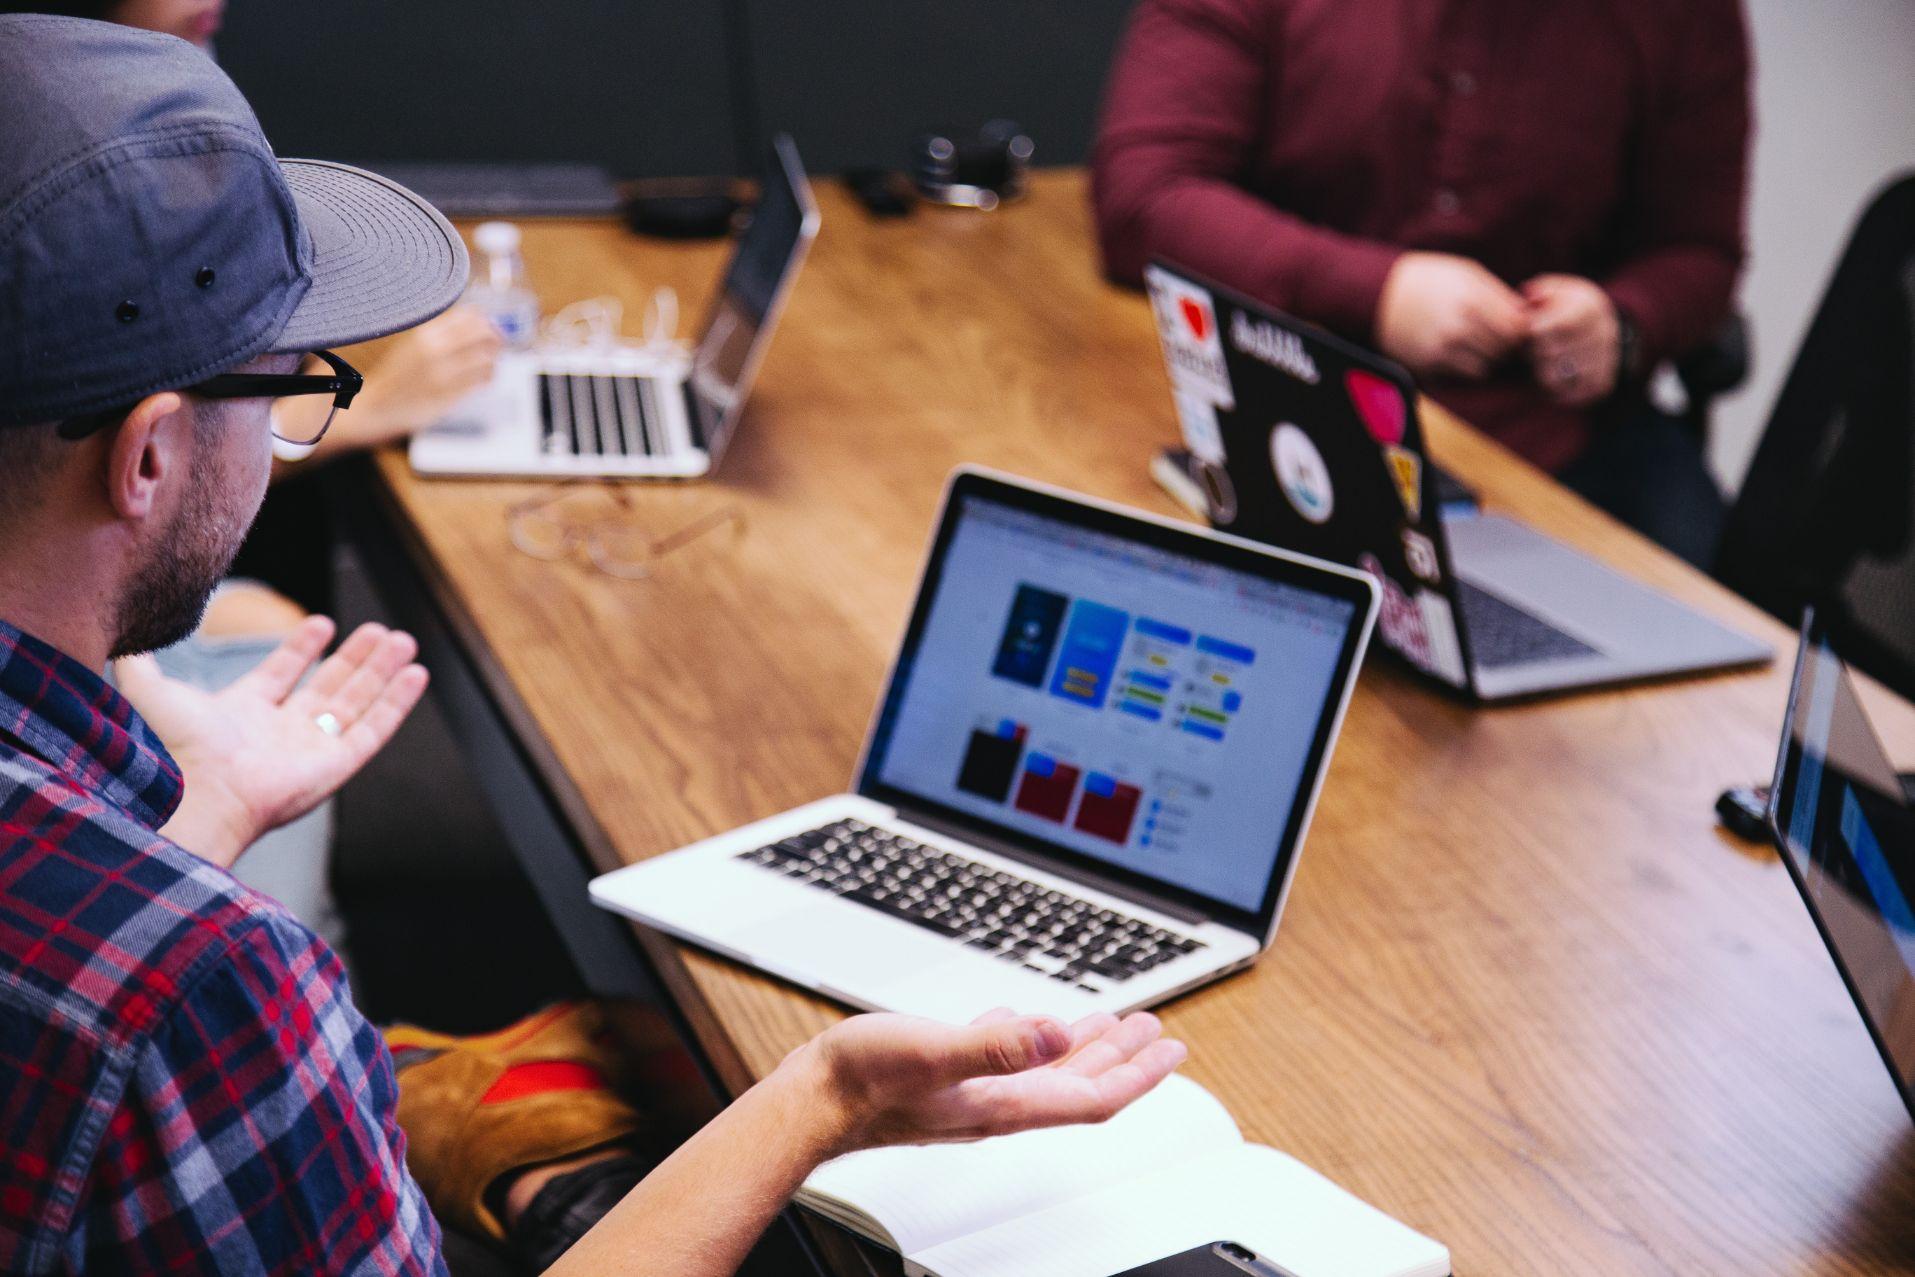 7 Tahap yang Perlu Diperhatikan untuk Menyelenggarakan Webinar